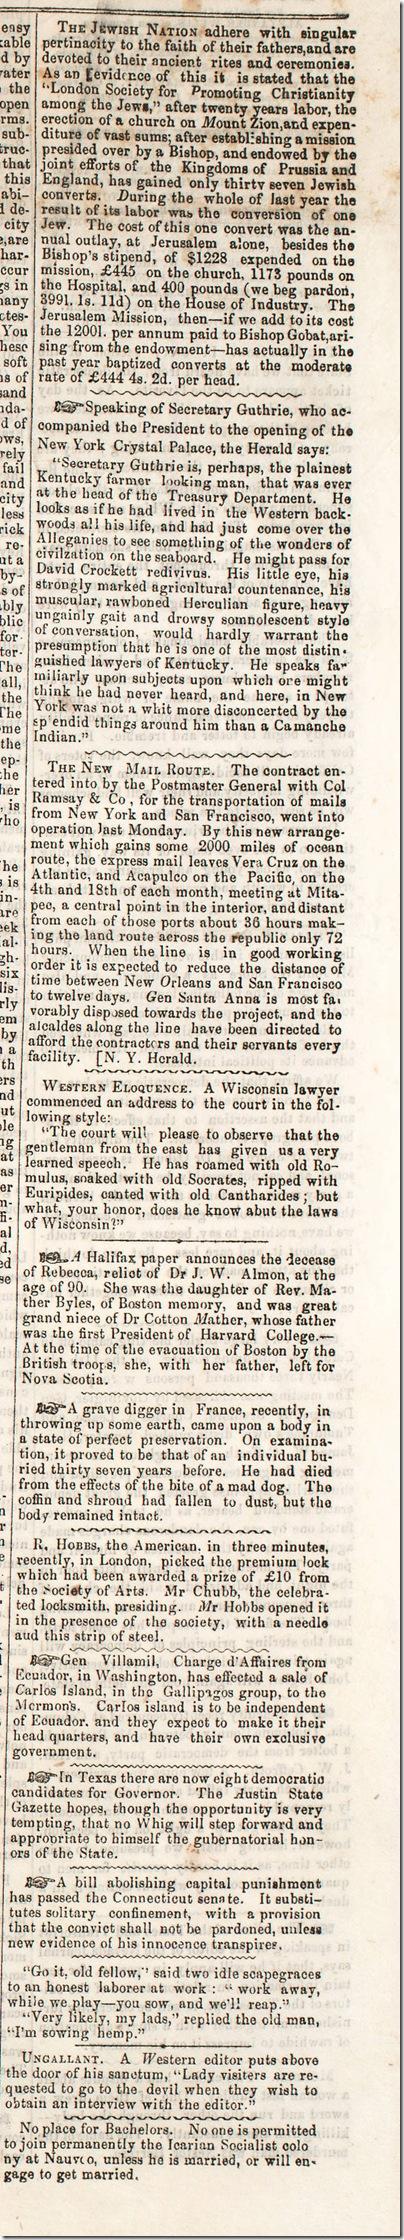 Sept. 3, 1853, Los Angeles Star